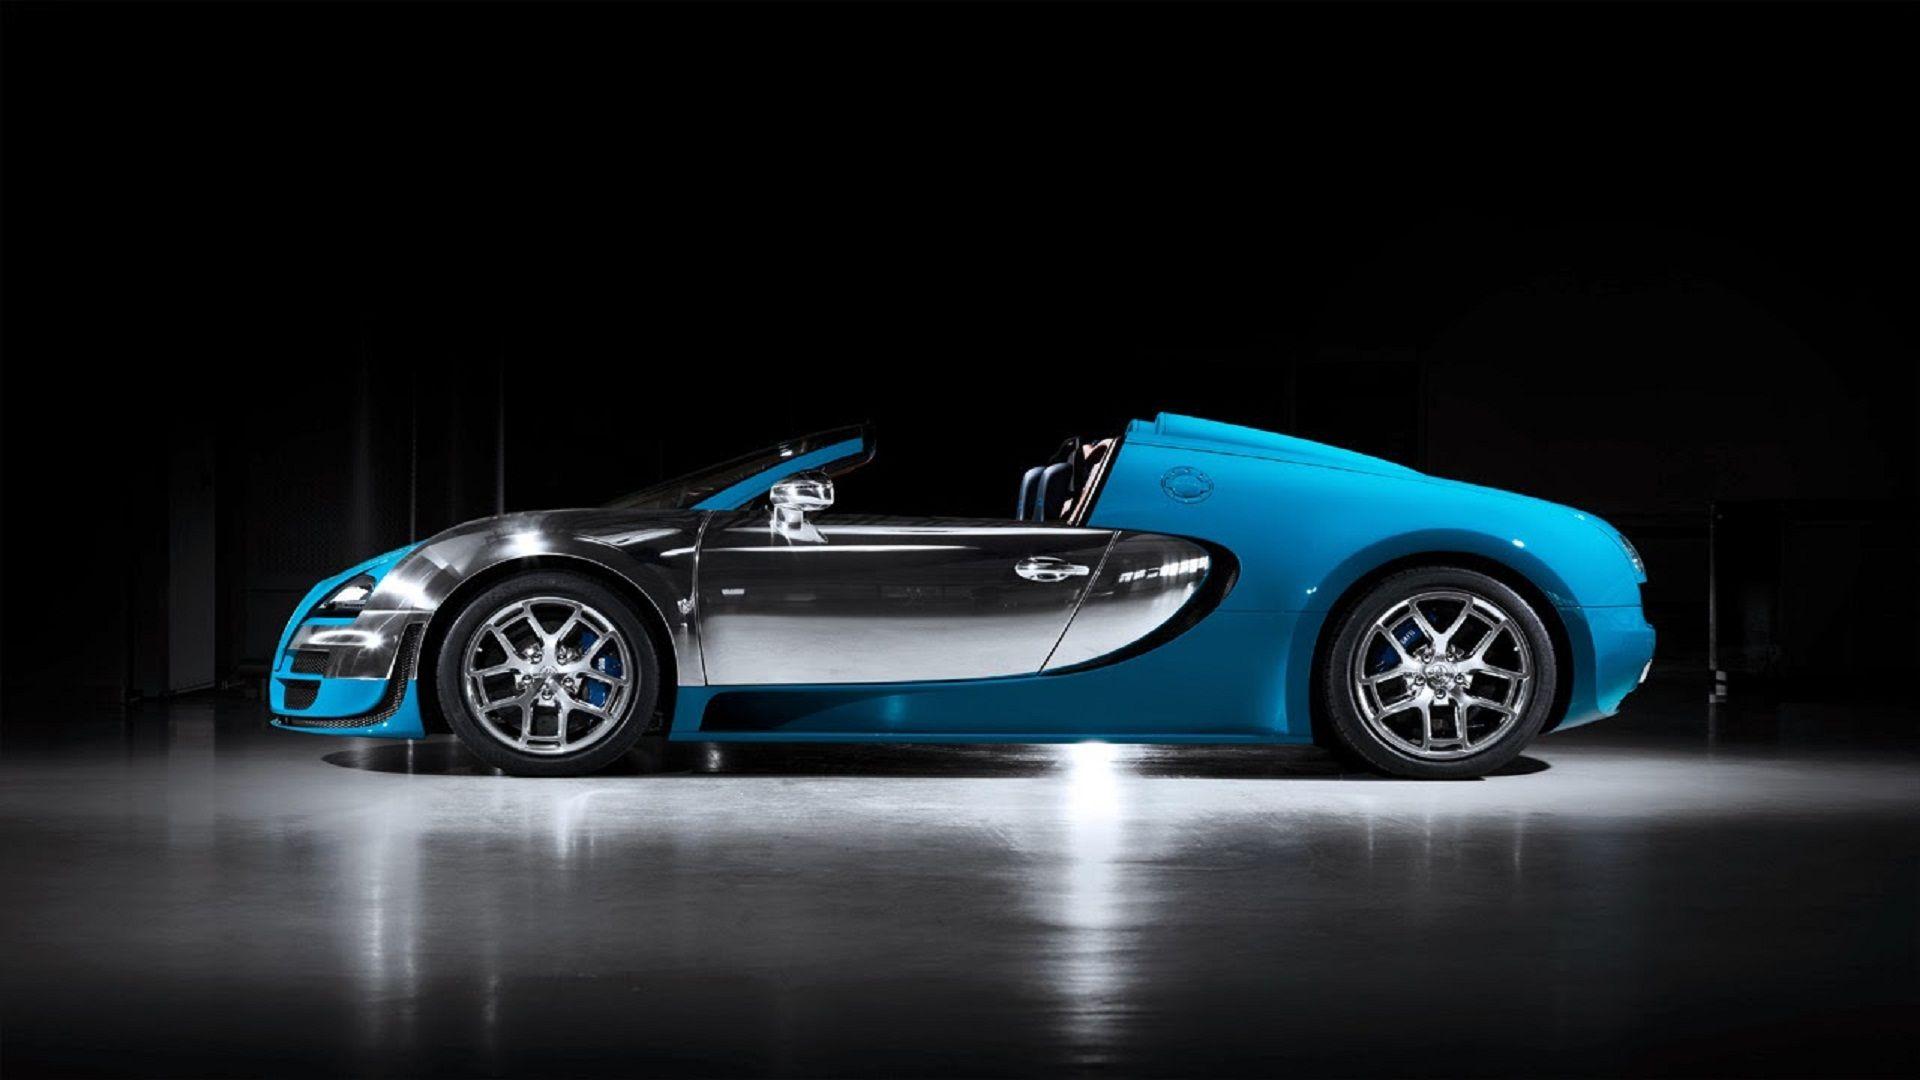 Bugatti Veyron Bugatti Veyron Grand Sport Vitesse Bugatti Veyron 16